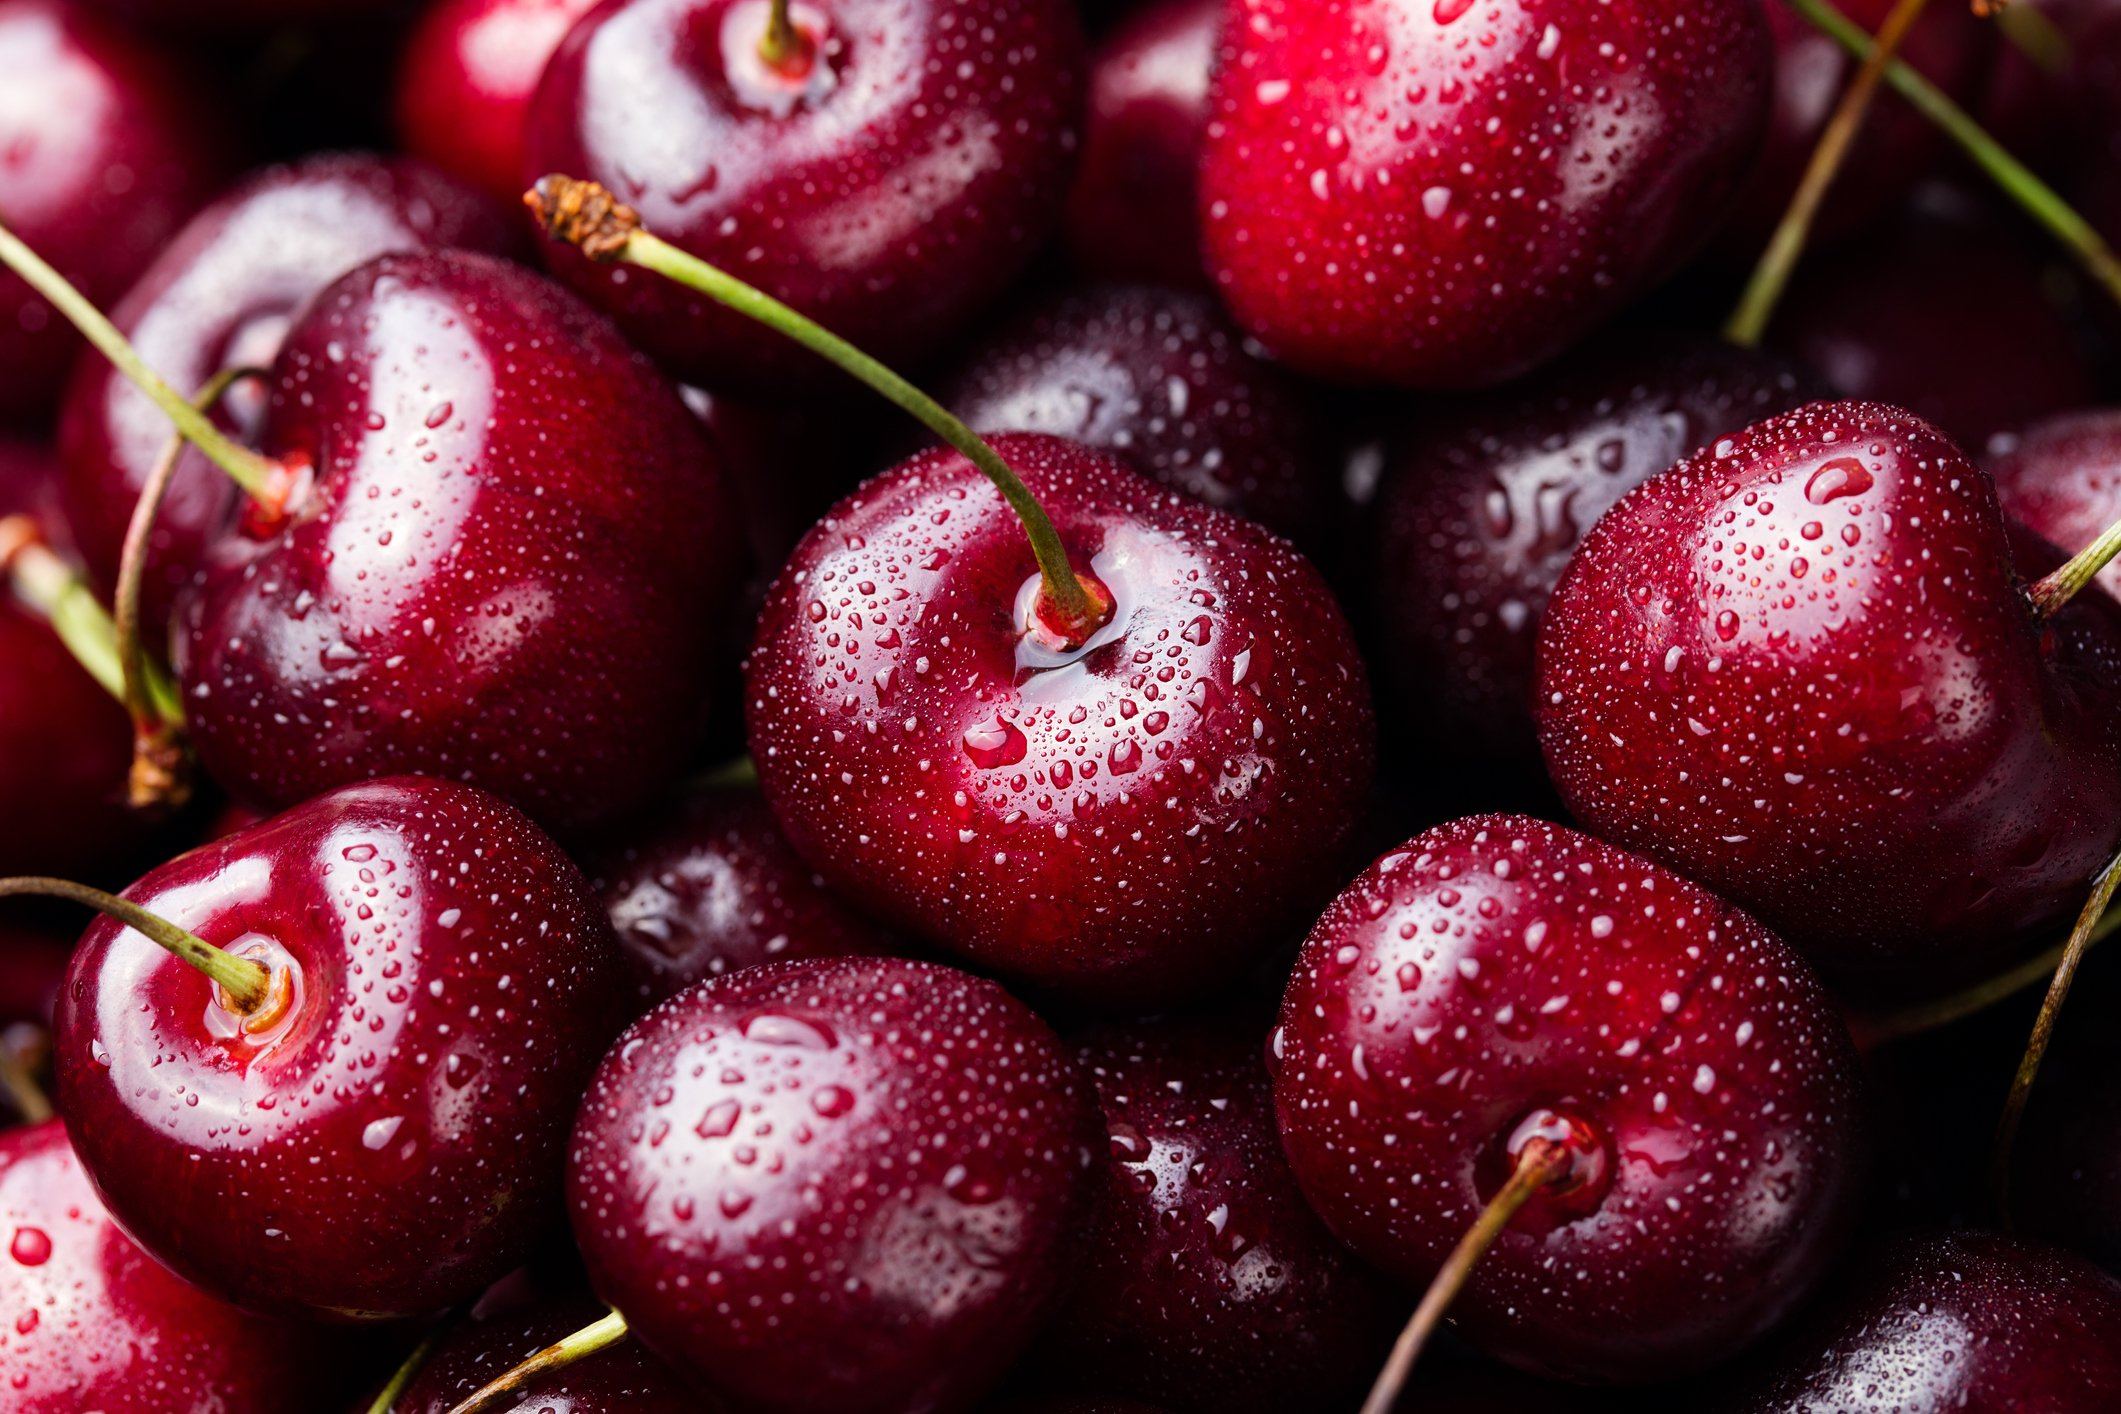 Cherie cherie: 6 impressive health benefits of Turkey's cherries   Daily  Sabah